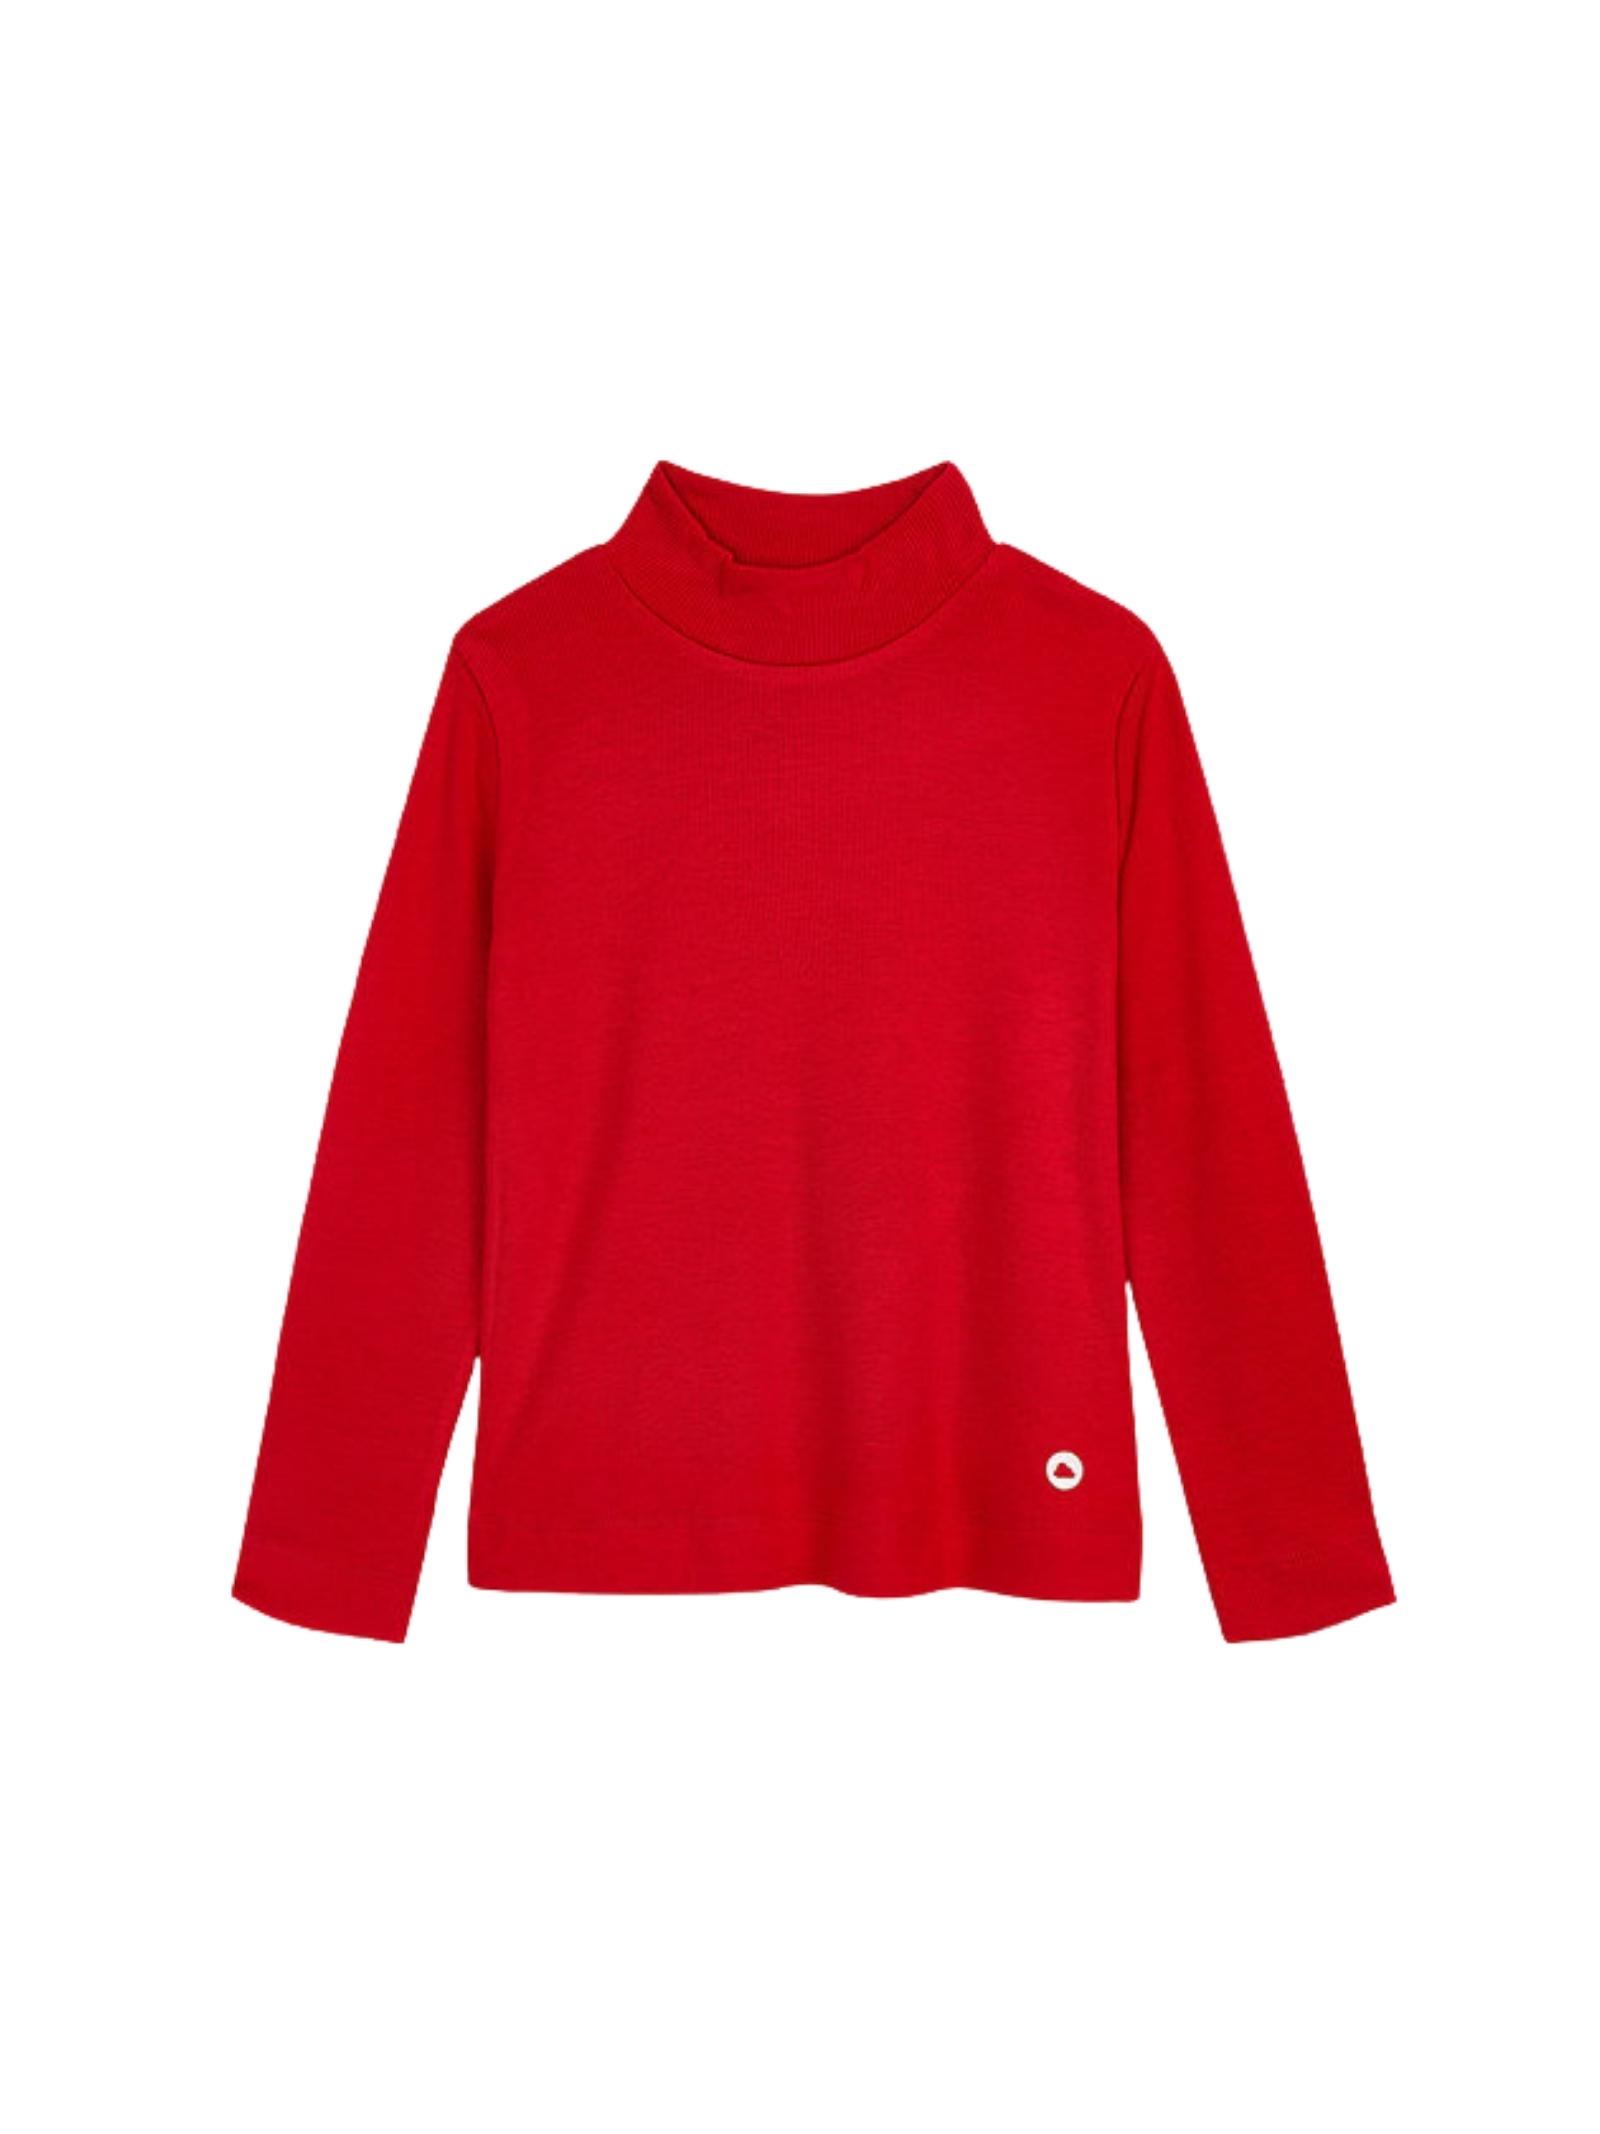 Lupetto Basic Red Bambina MAYORAL   Lupetto   13685